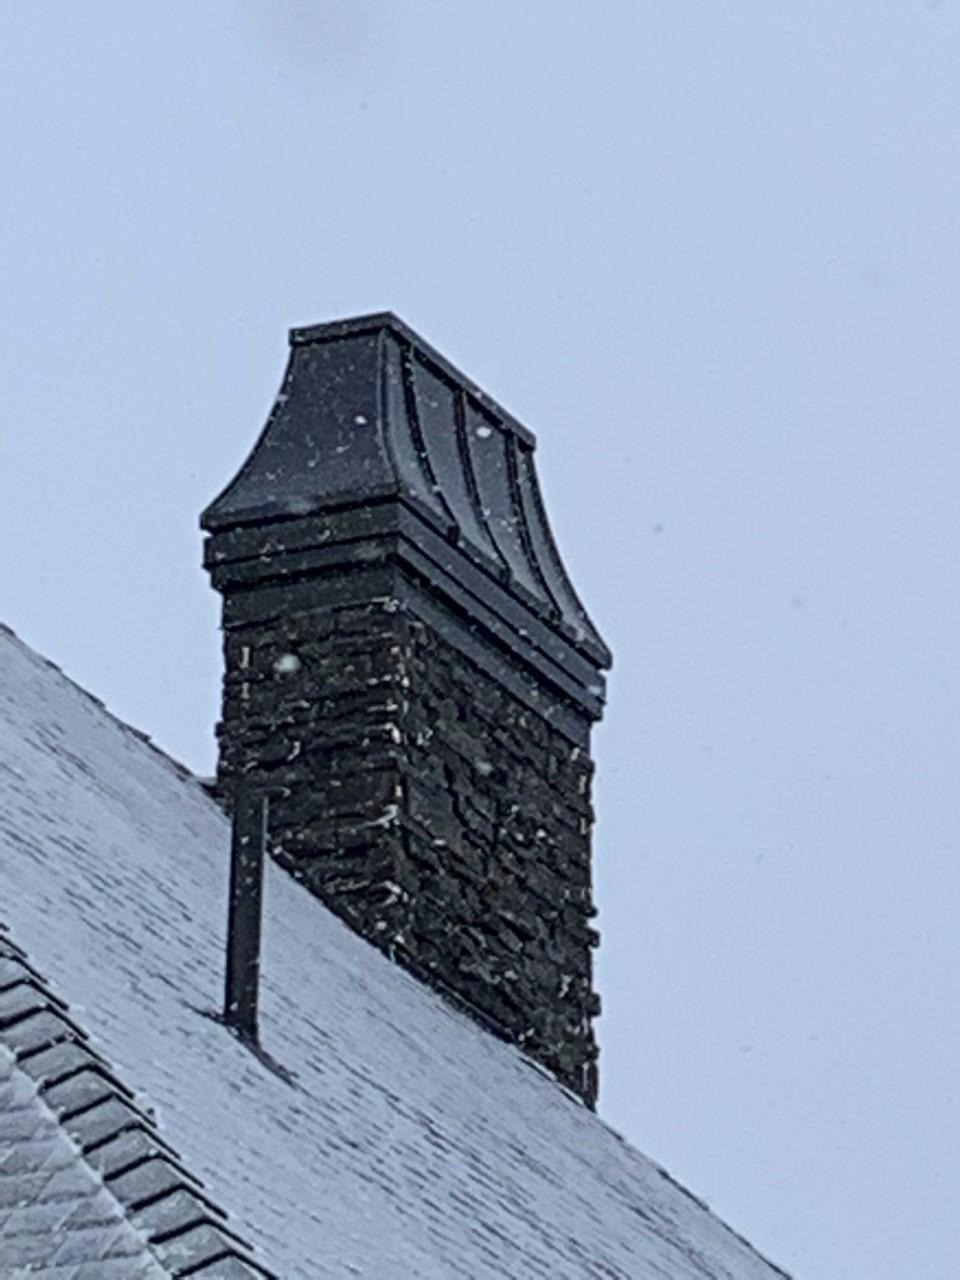 Black Chimney Cap